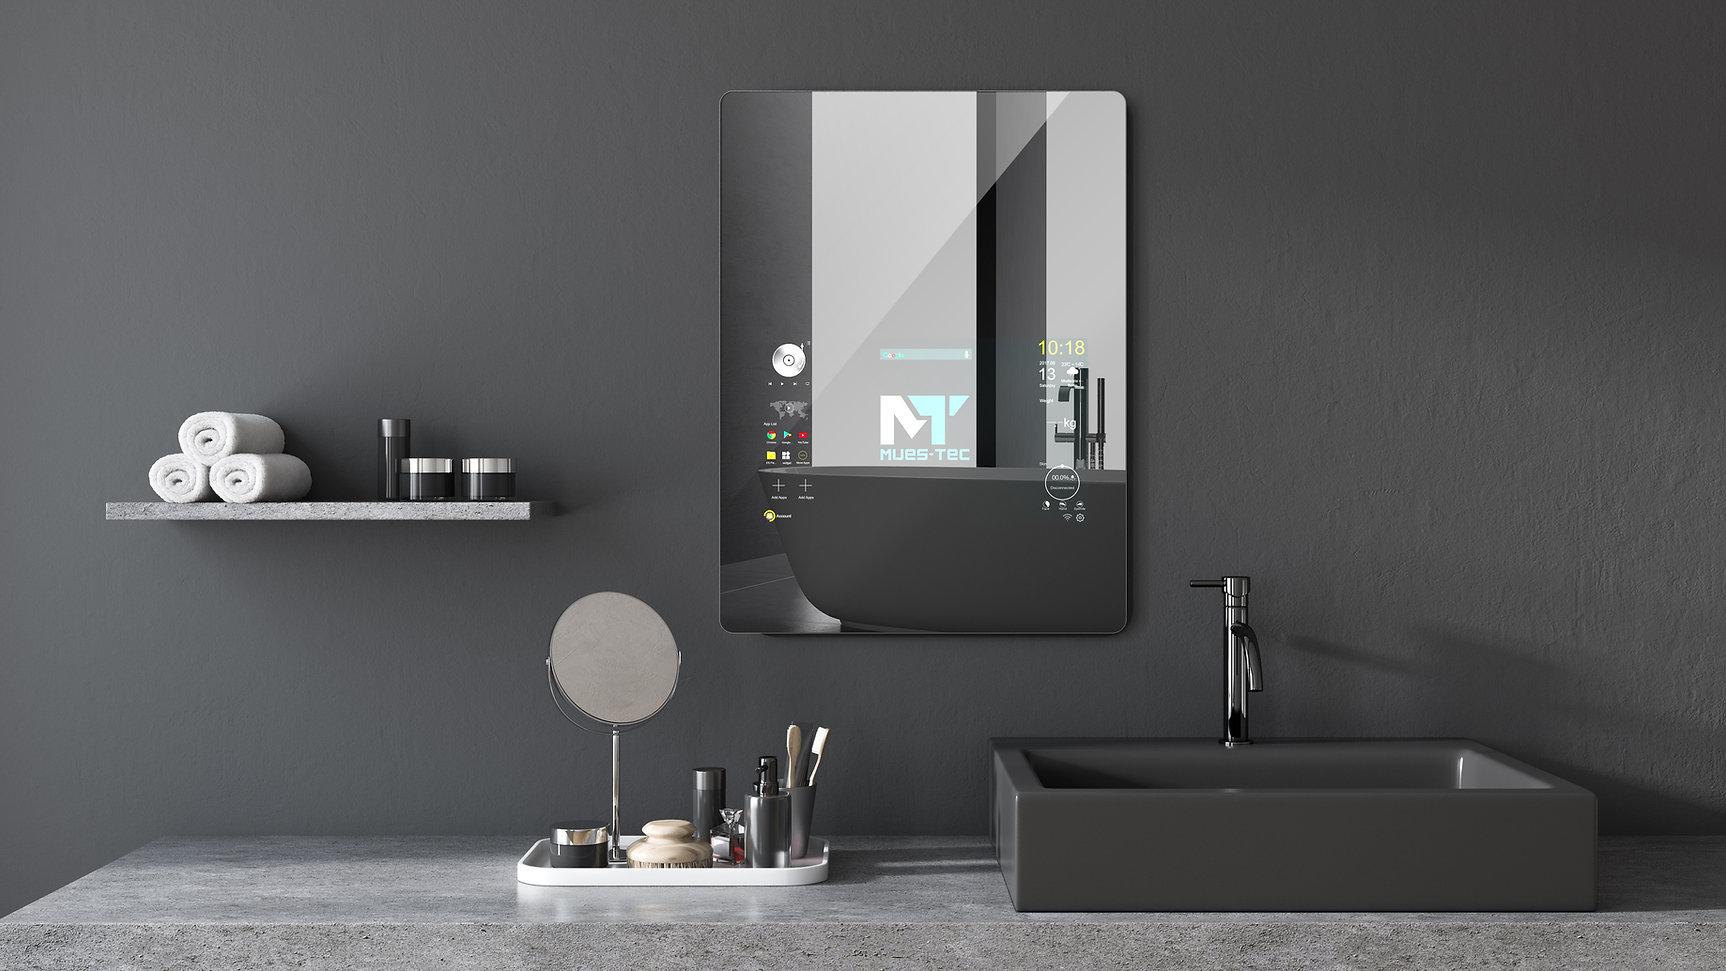 mues-tec_smartmirror_smartspiegel_300_15